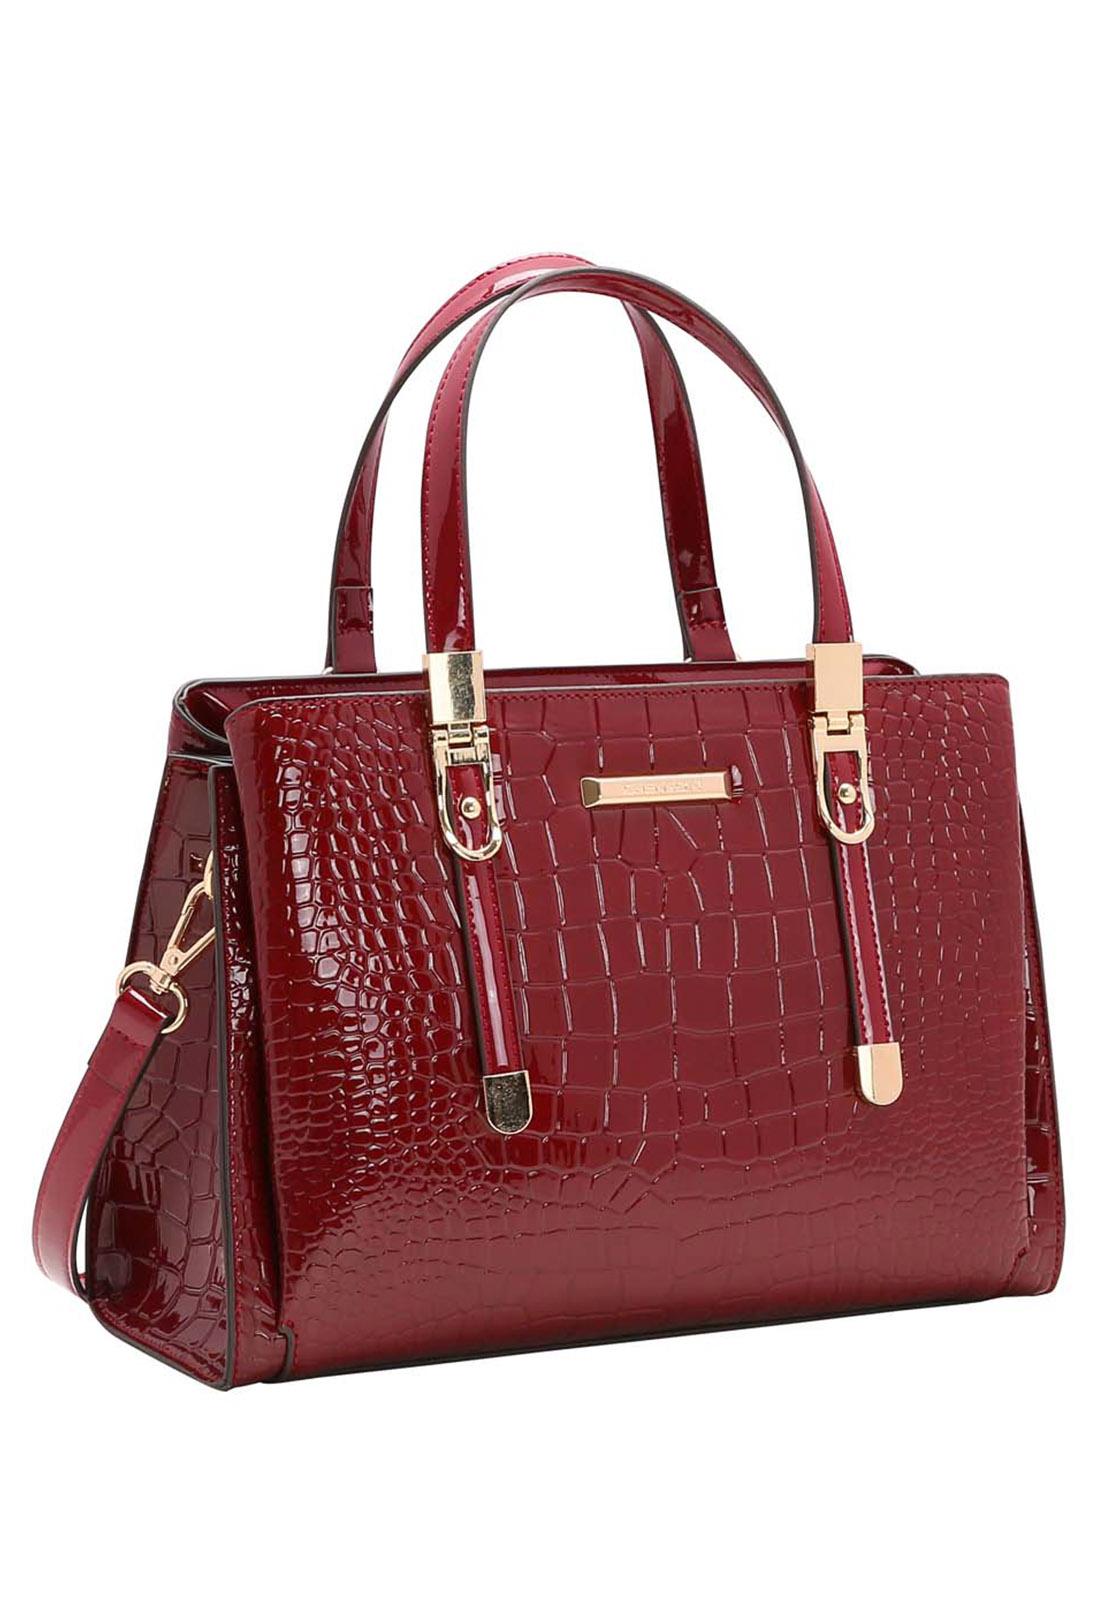 Bolsa Feminina Chenson Croco Verniz  Mão 3483492